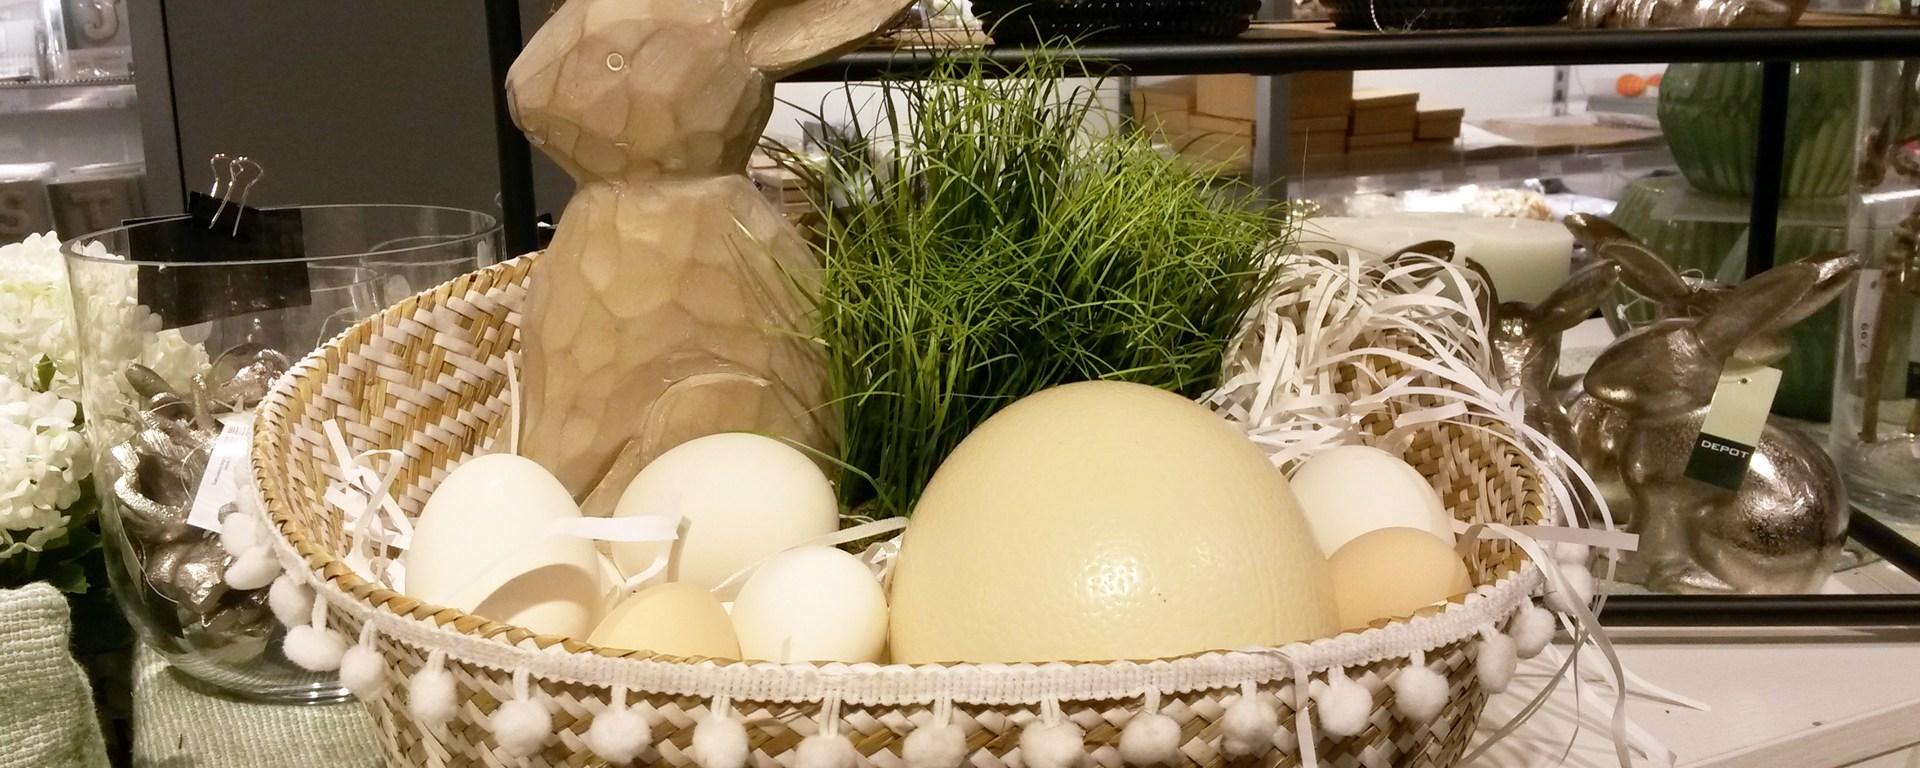 Holzhase und Eier im Nest